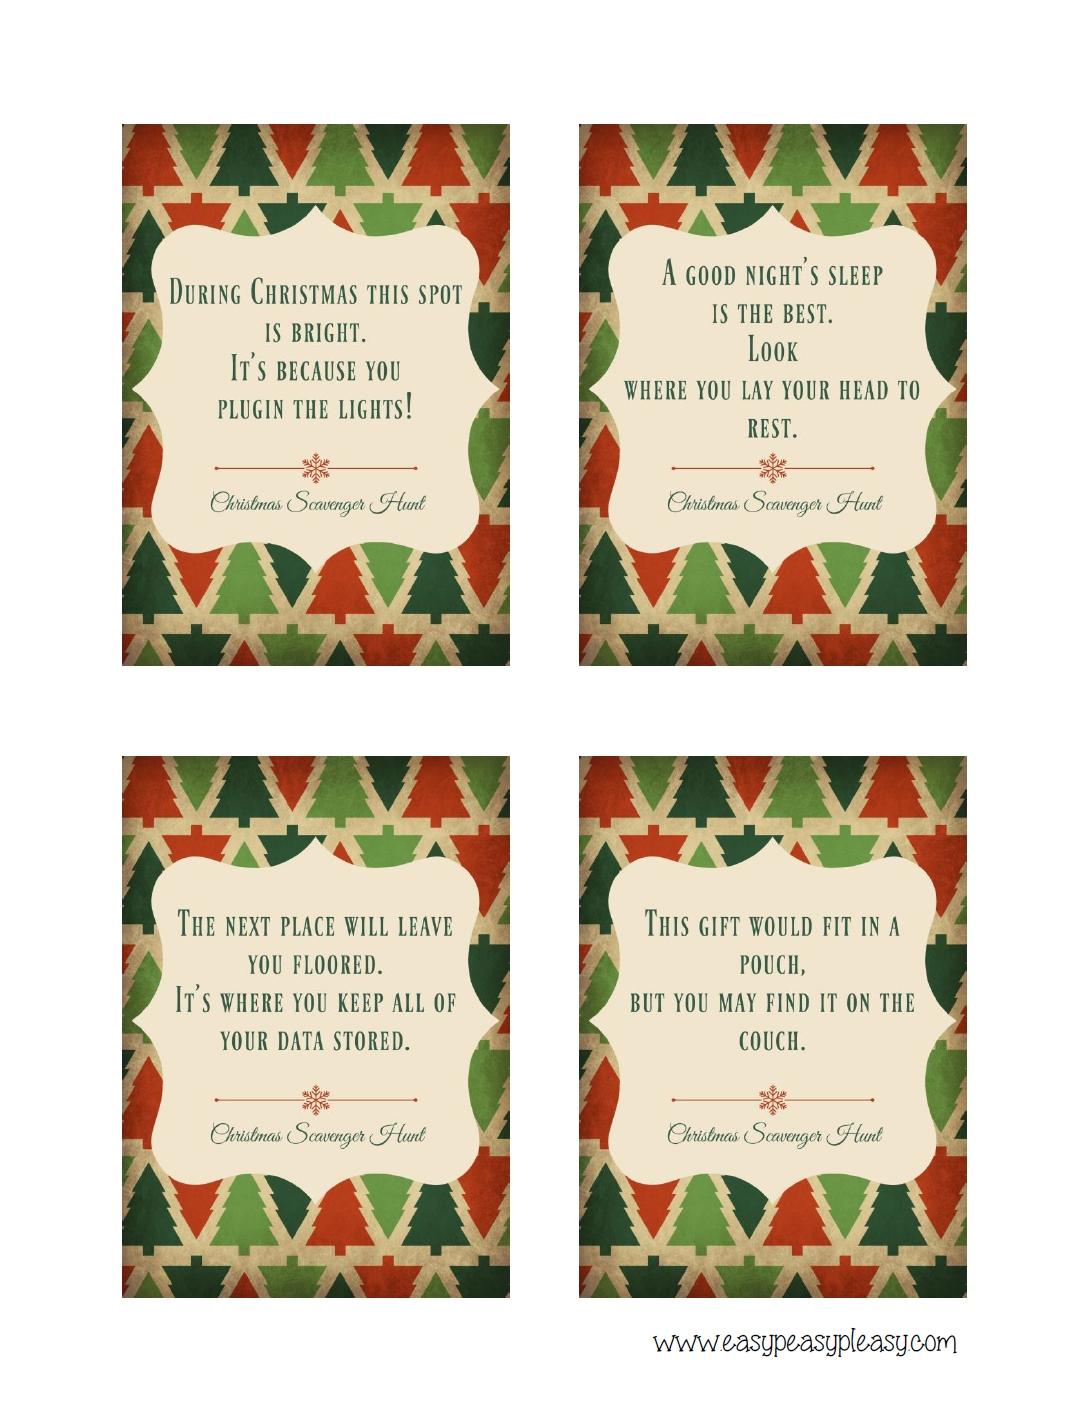 10 Fashionable Christmas Scavenger Hunt Ideas For Adults christmas scavenger hunt with free printable clues easy peasy pleasy 2020